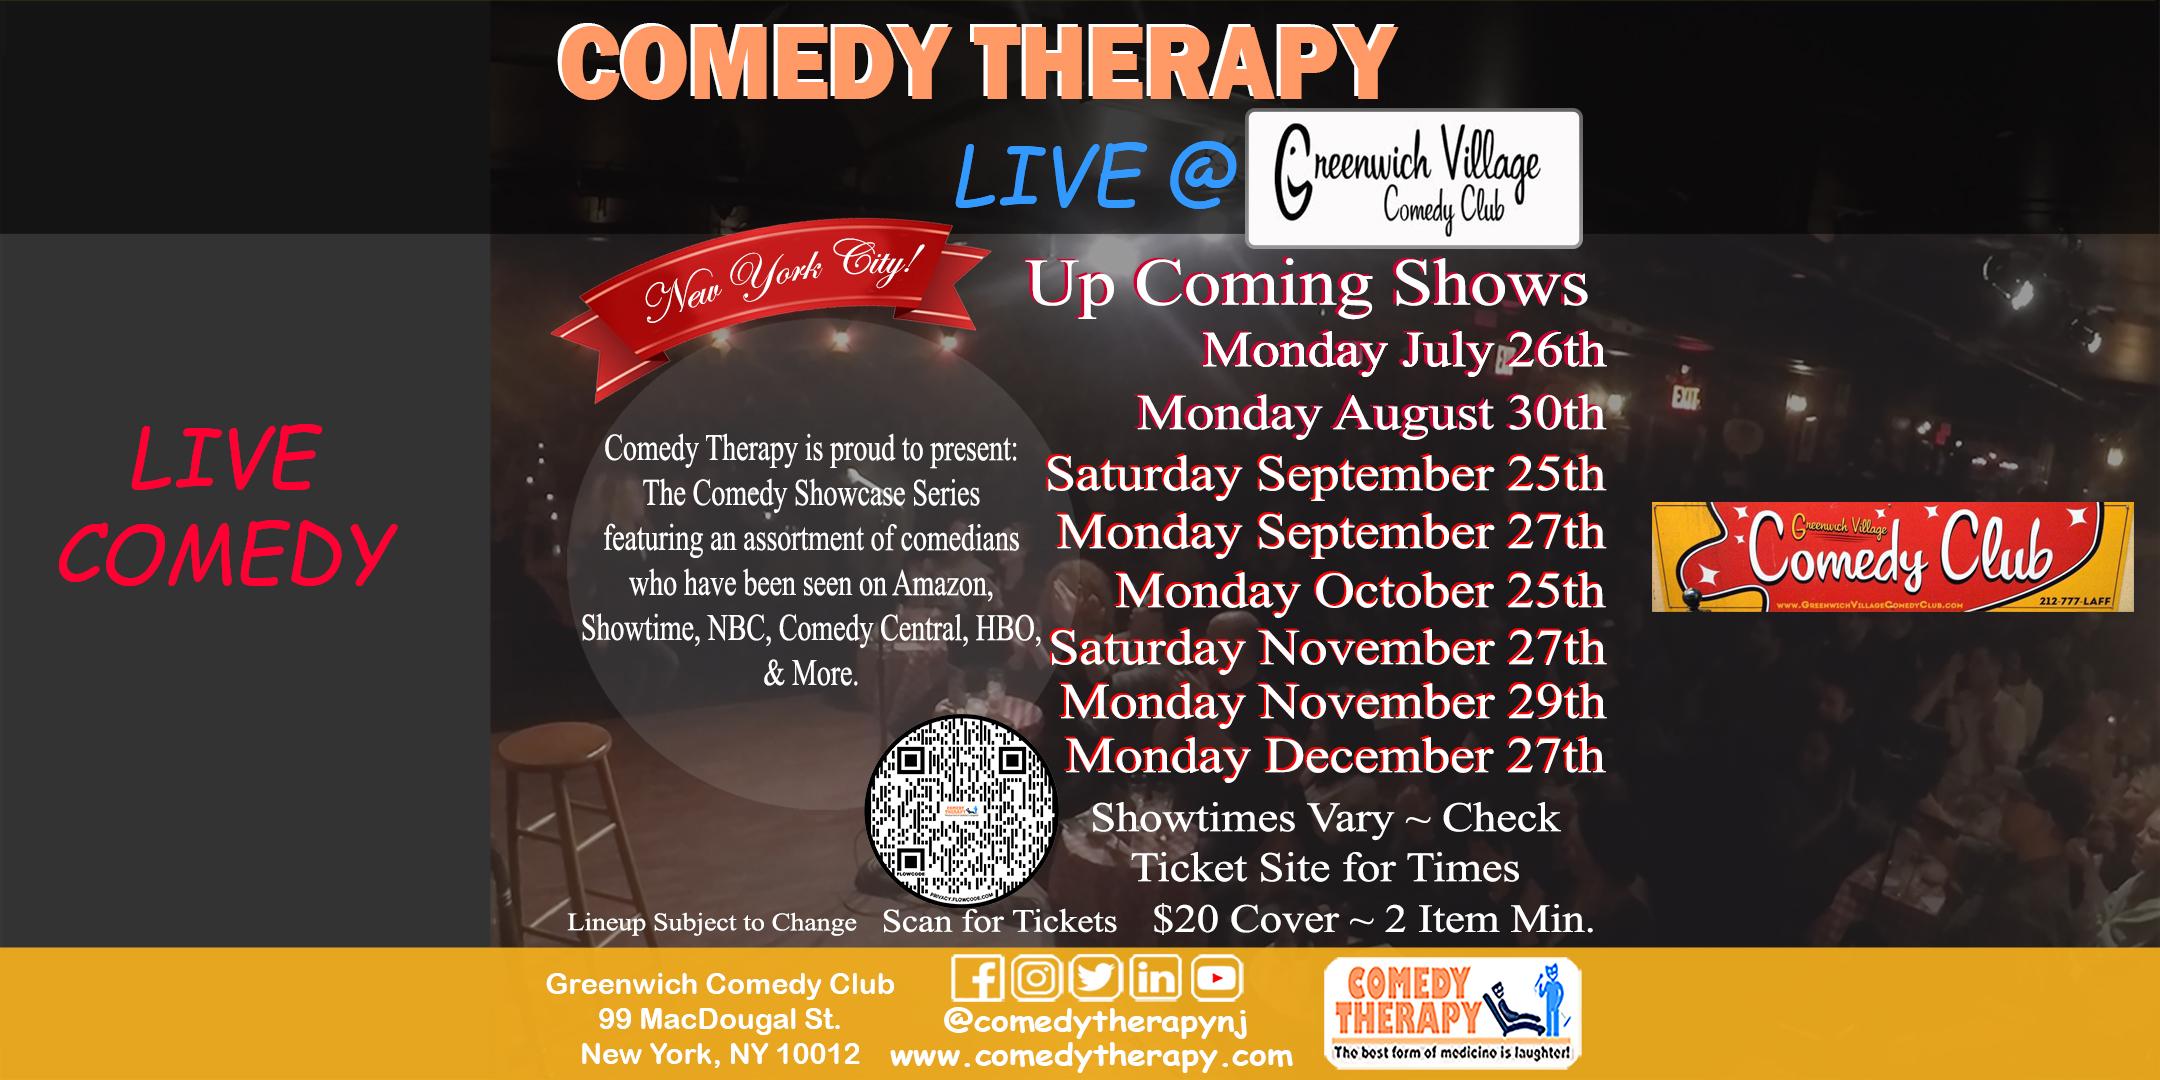 Comedy Therapy Live Greenwich Comedy Club